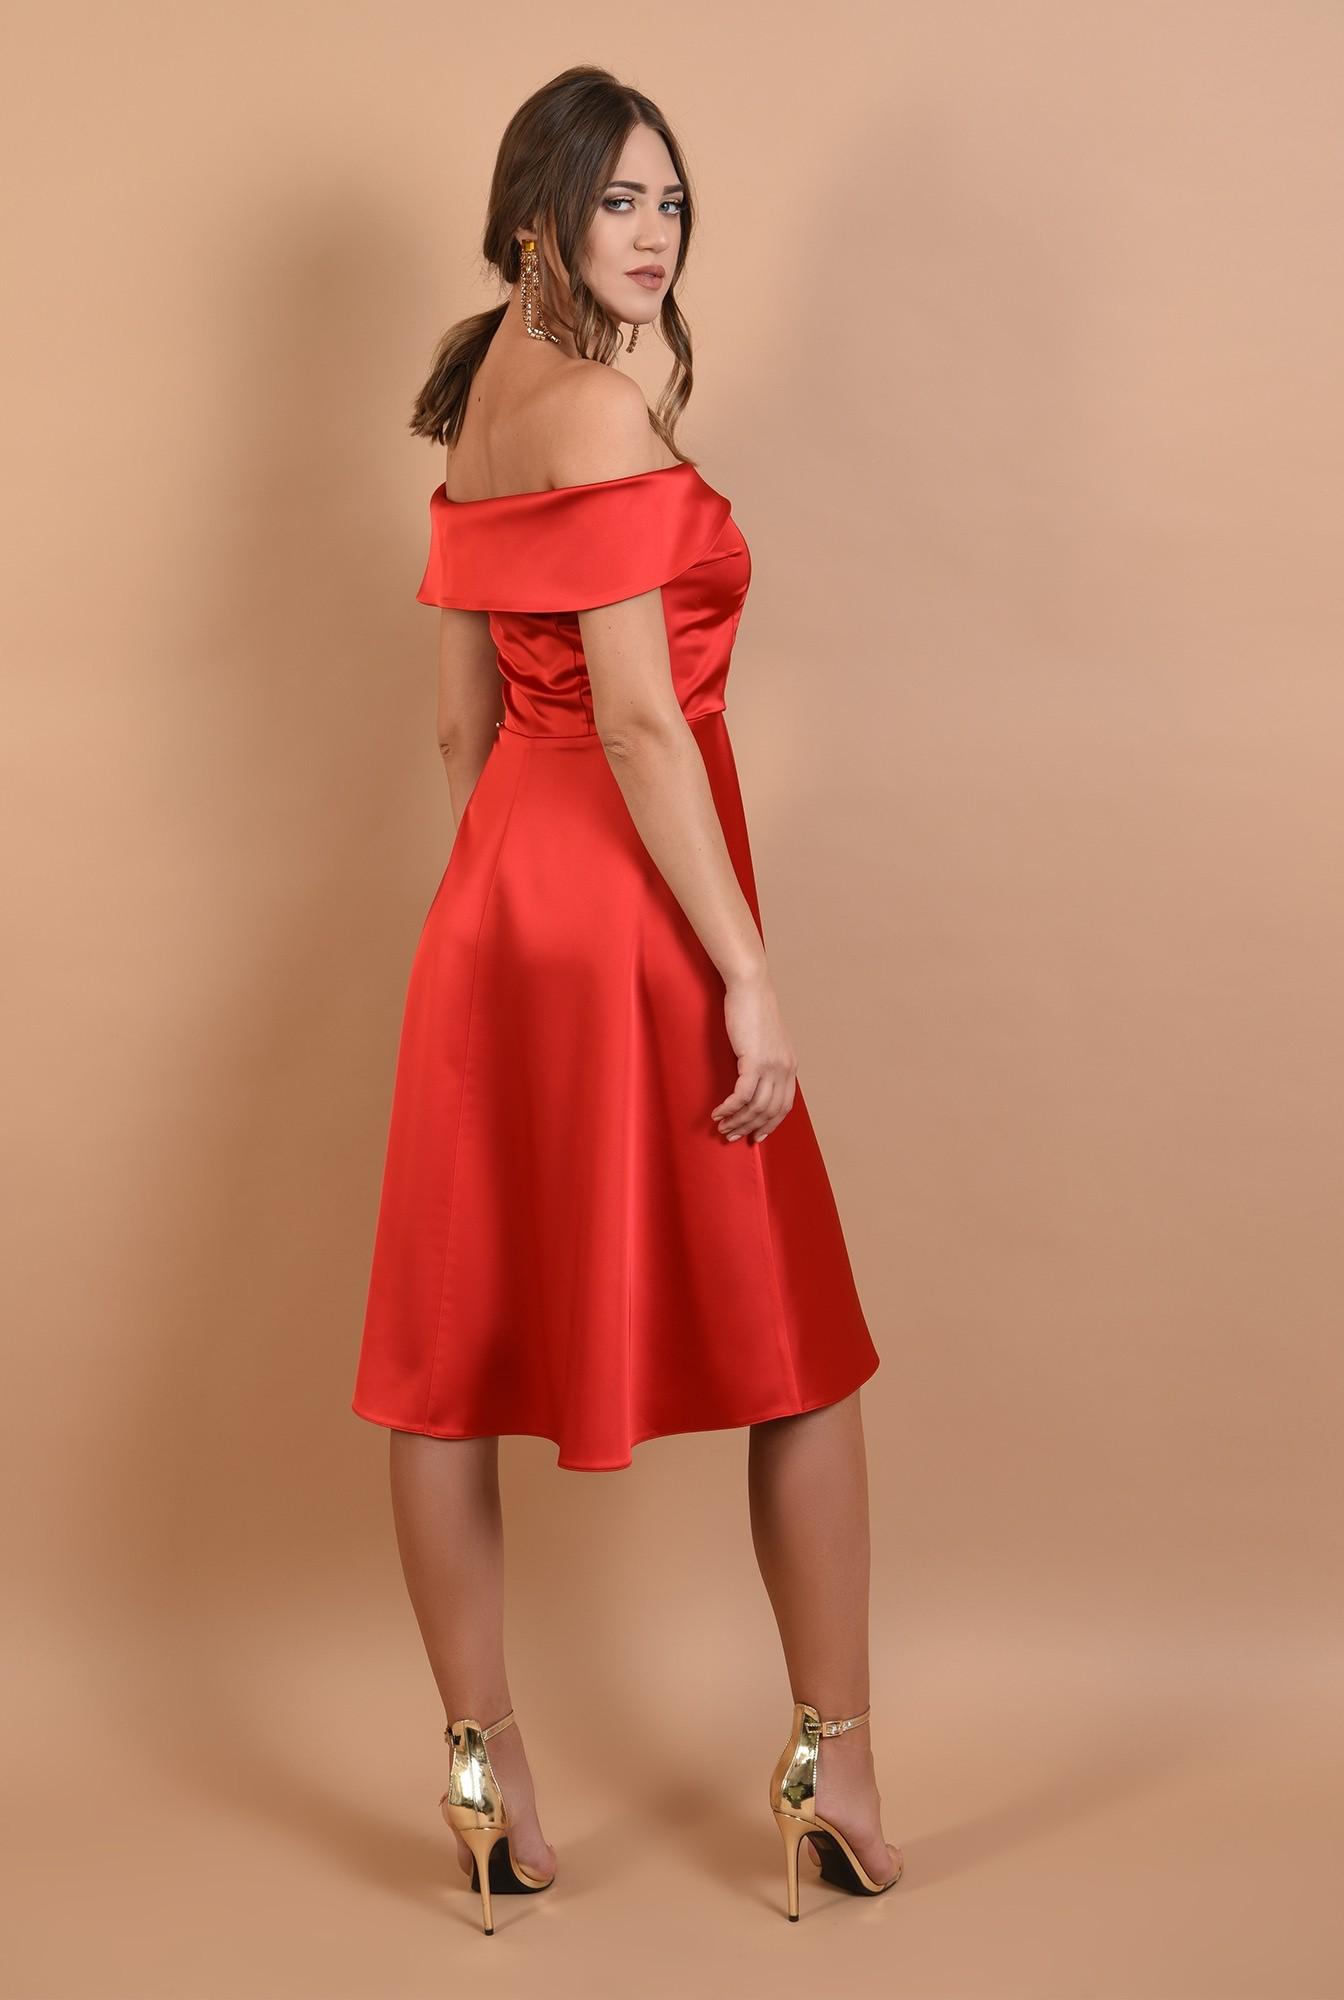 1 - 360 - rochie de ocazie, rosie, evazata, cu umeri goi